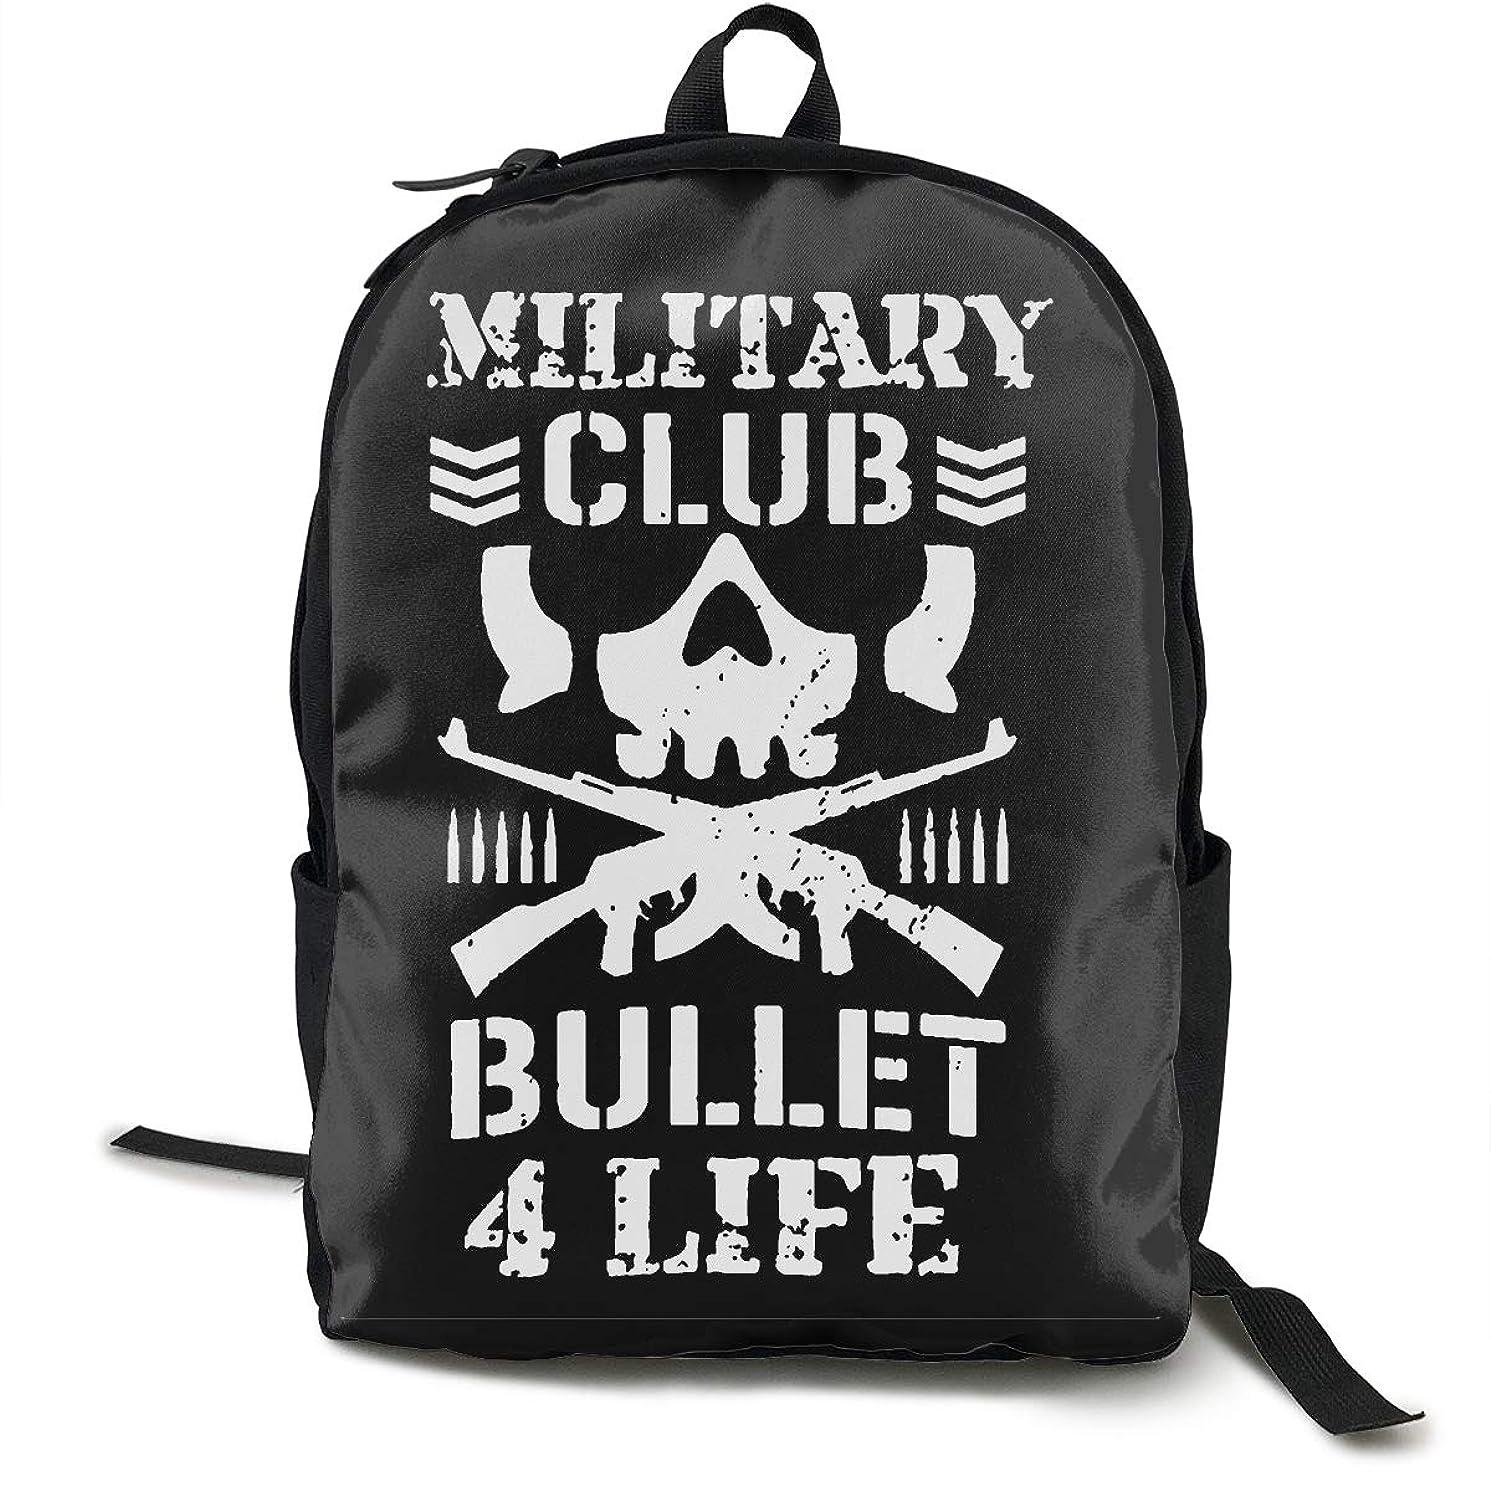 Bullet Club Kenny Omega Grunt Style Backpacks Waterproof Shoulder Bags Laptop School Travel Large Bag for Men Women Black